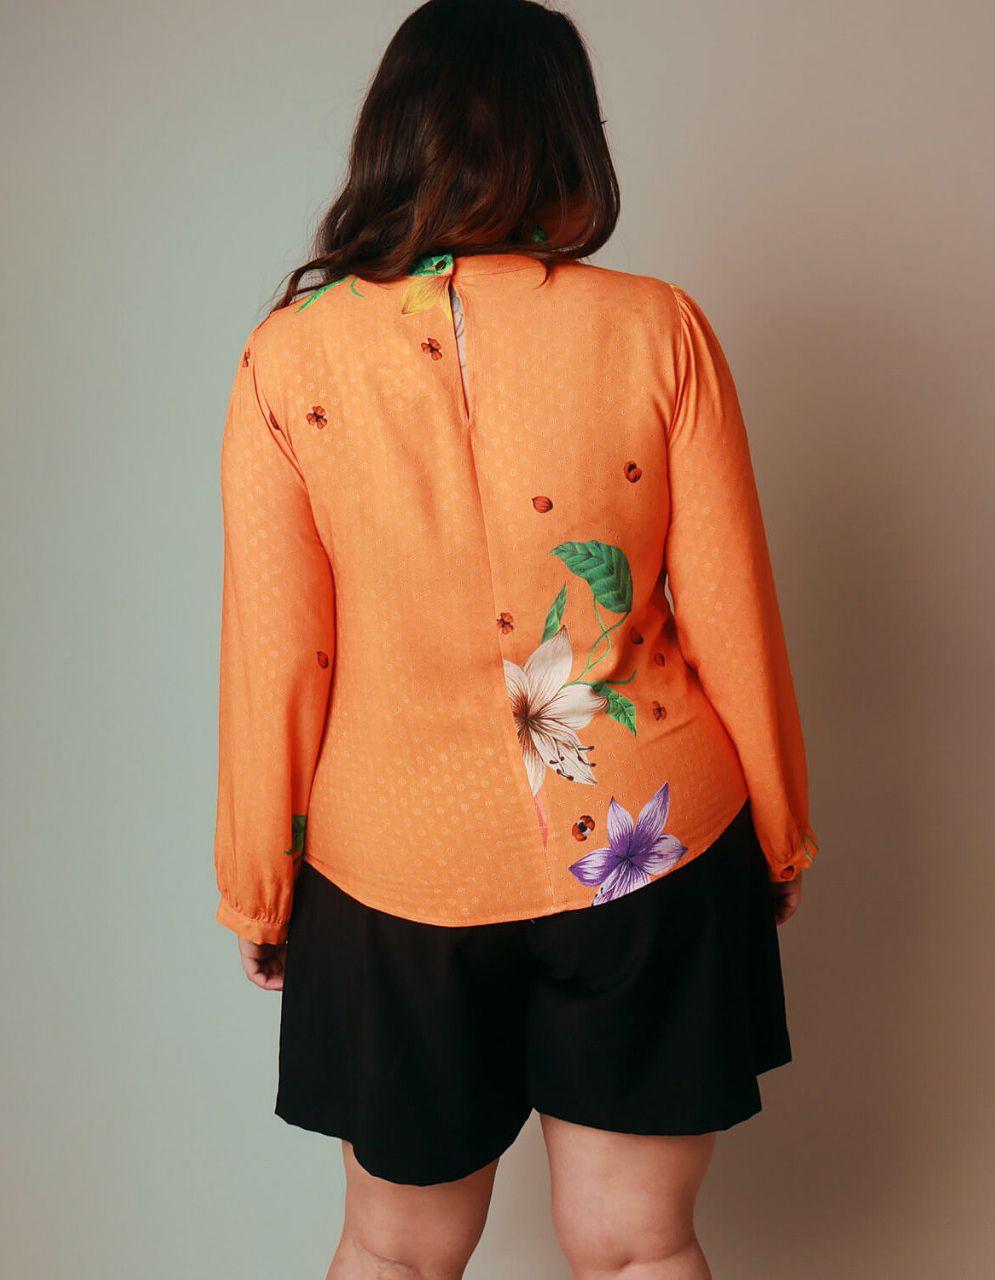 Blusa talla grande verano naranja manga larga y estampa floral Malagueta-57426MAL-B